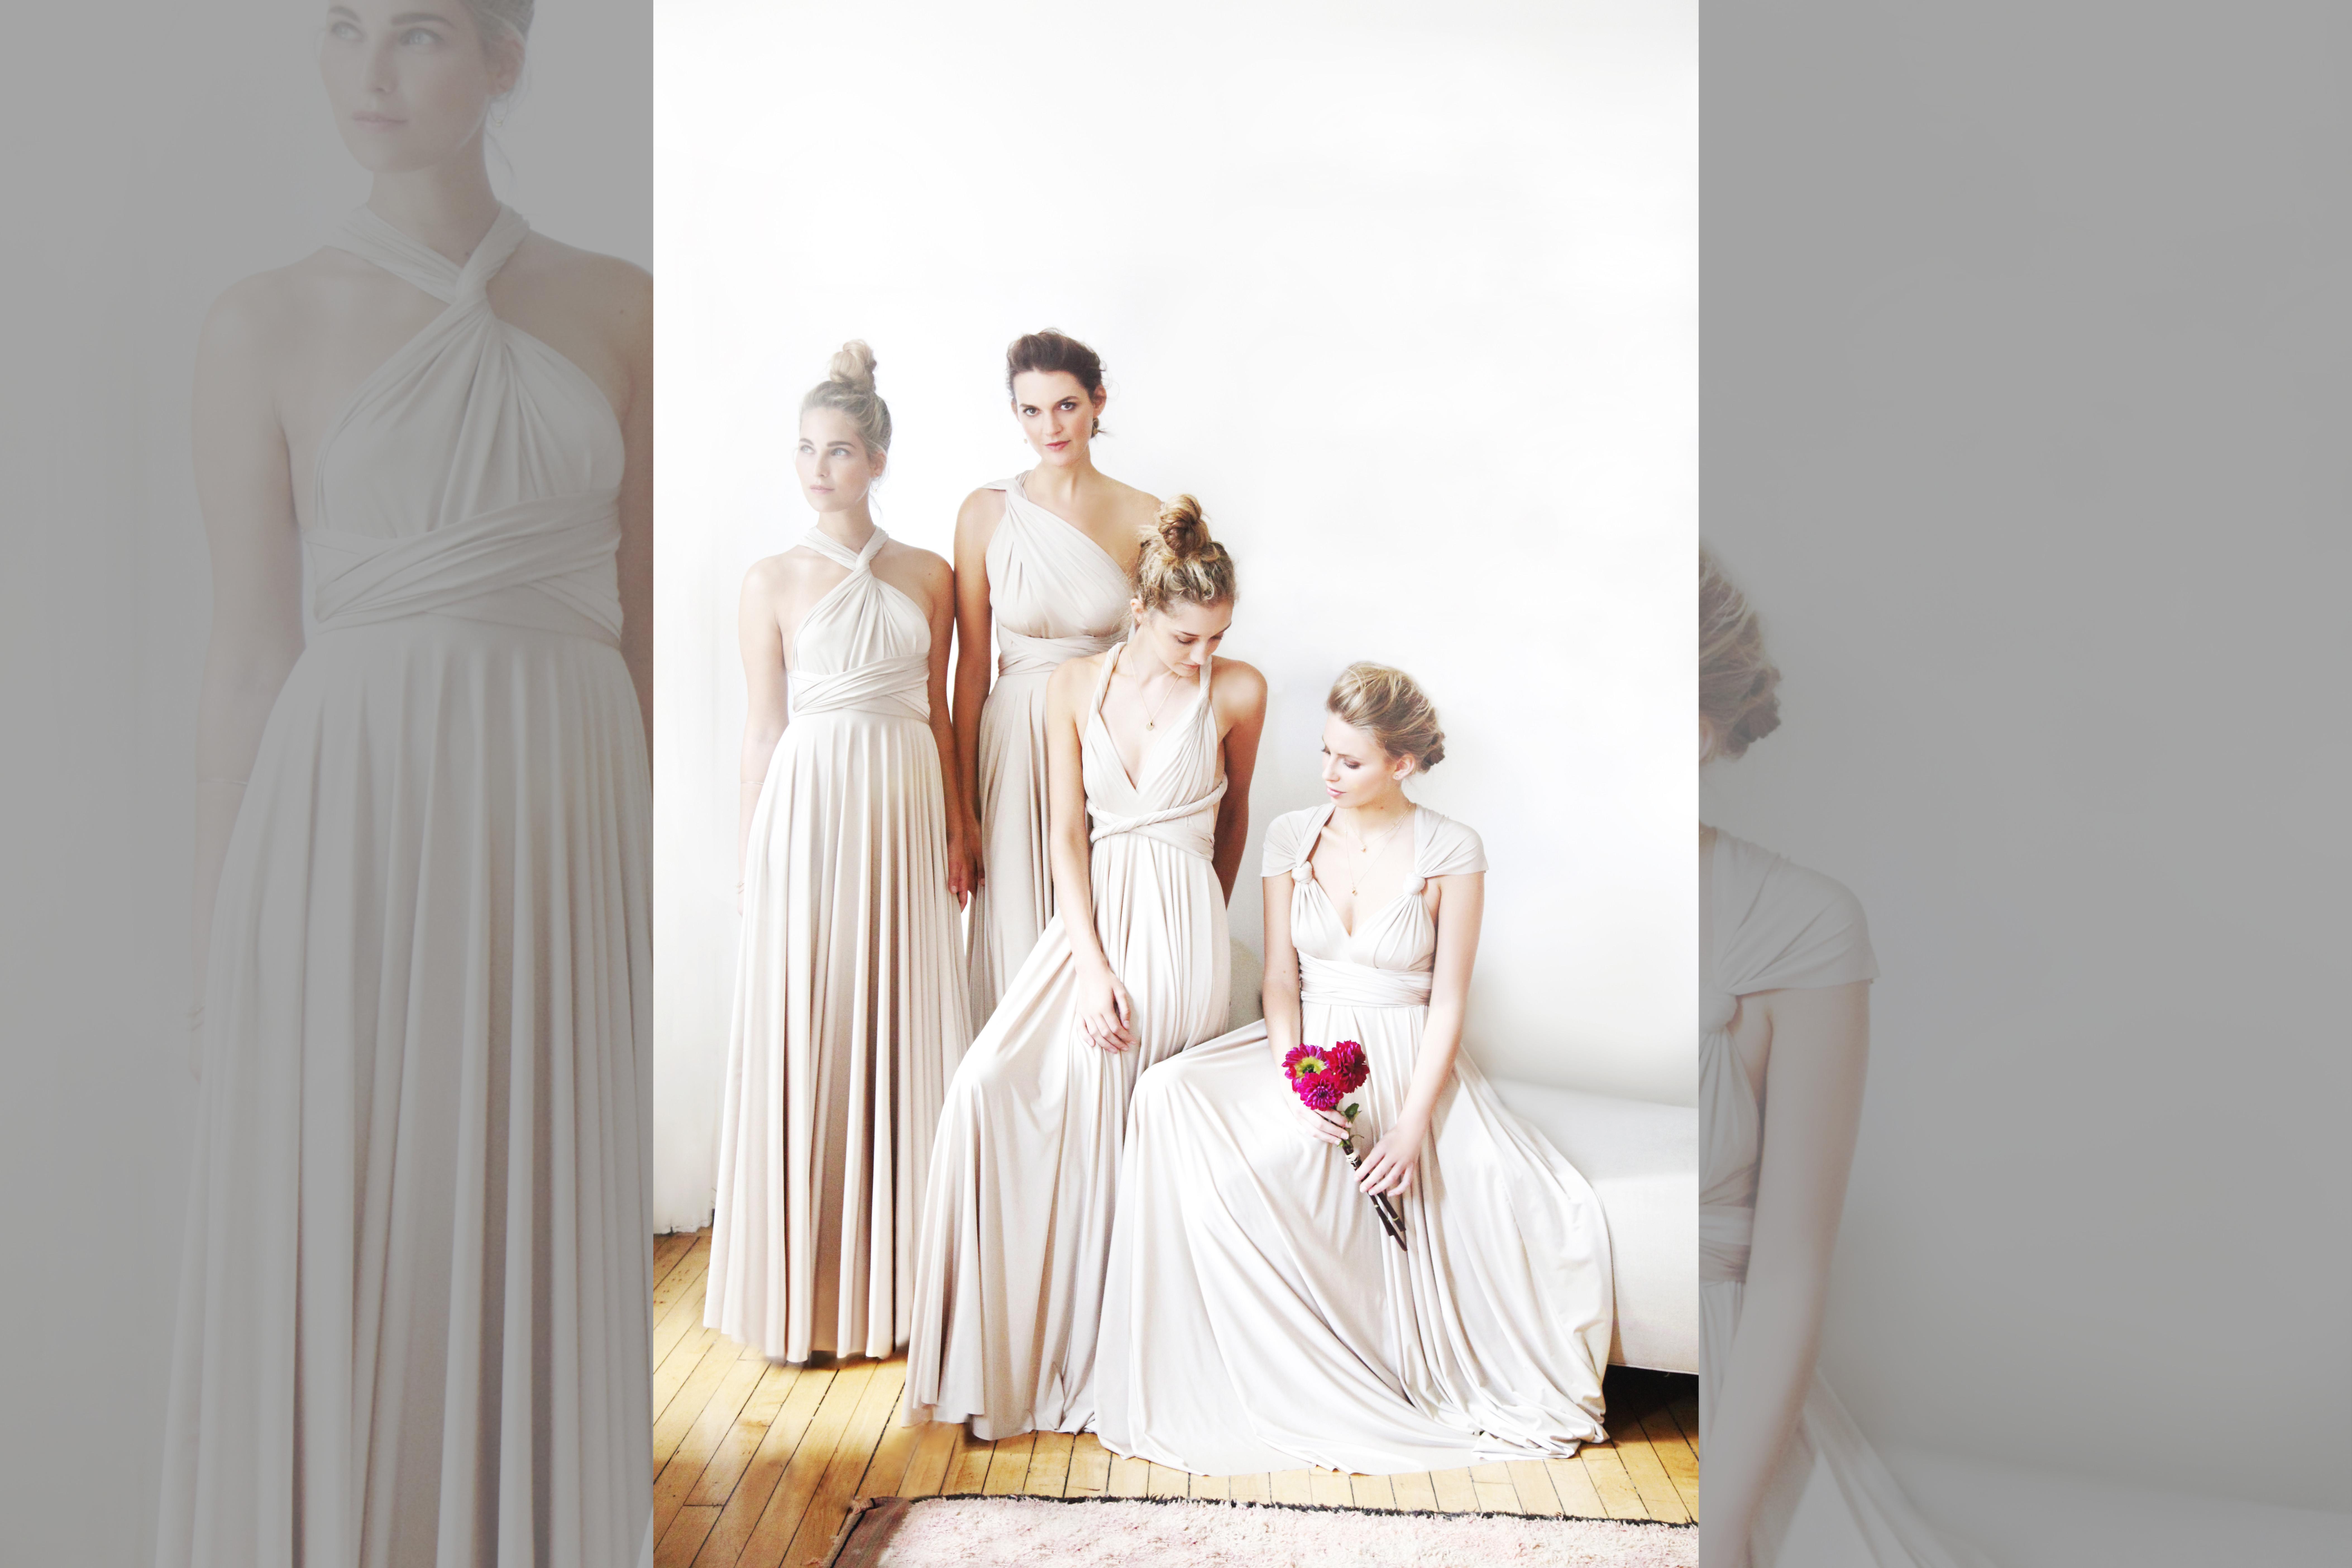 bridebook.co.uk twobirds champagne dresses